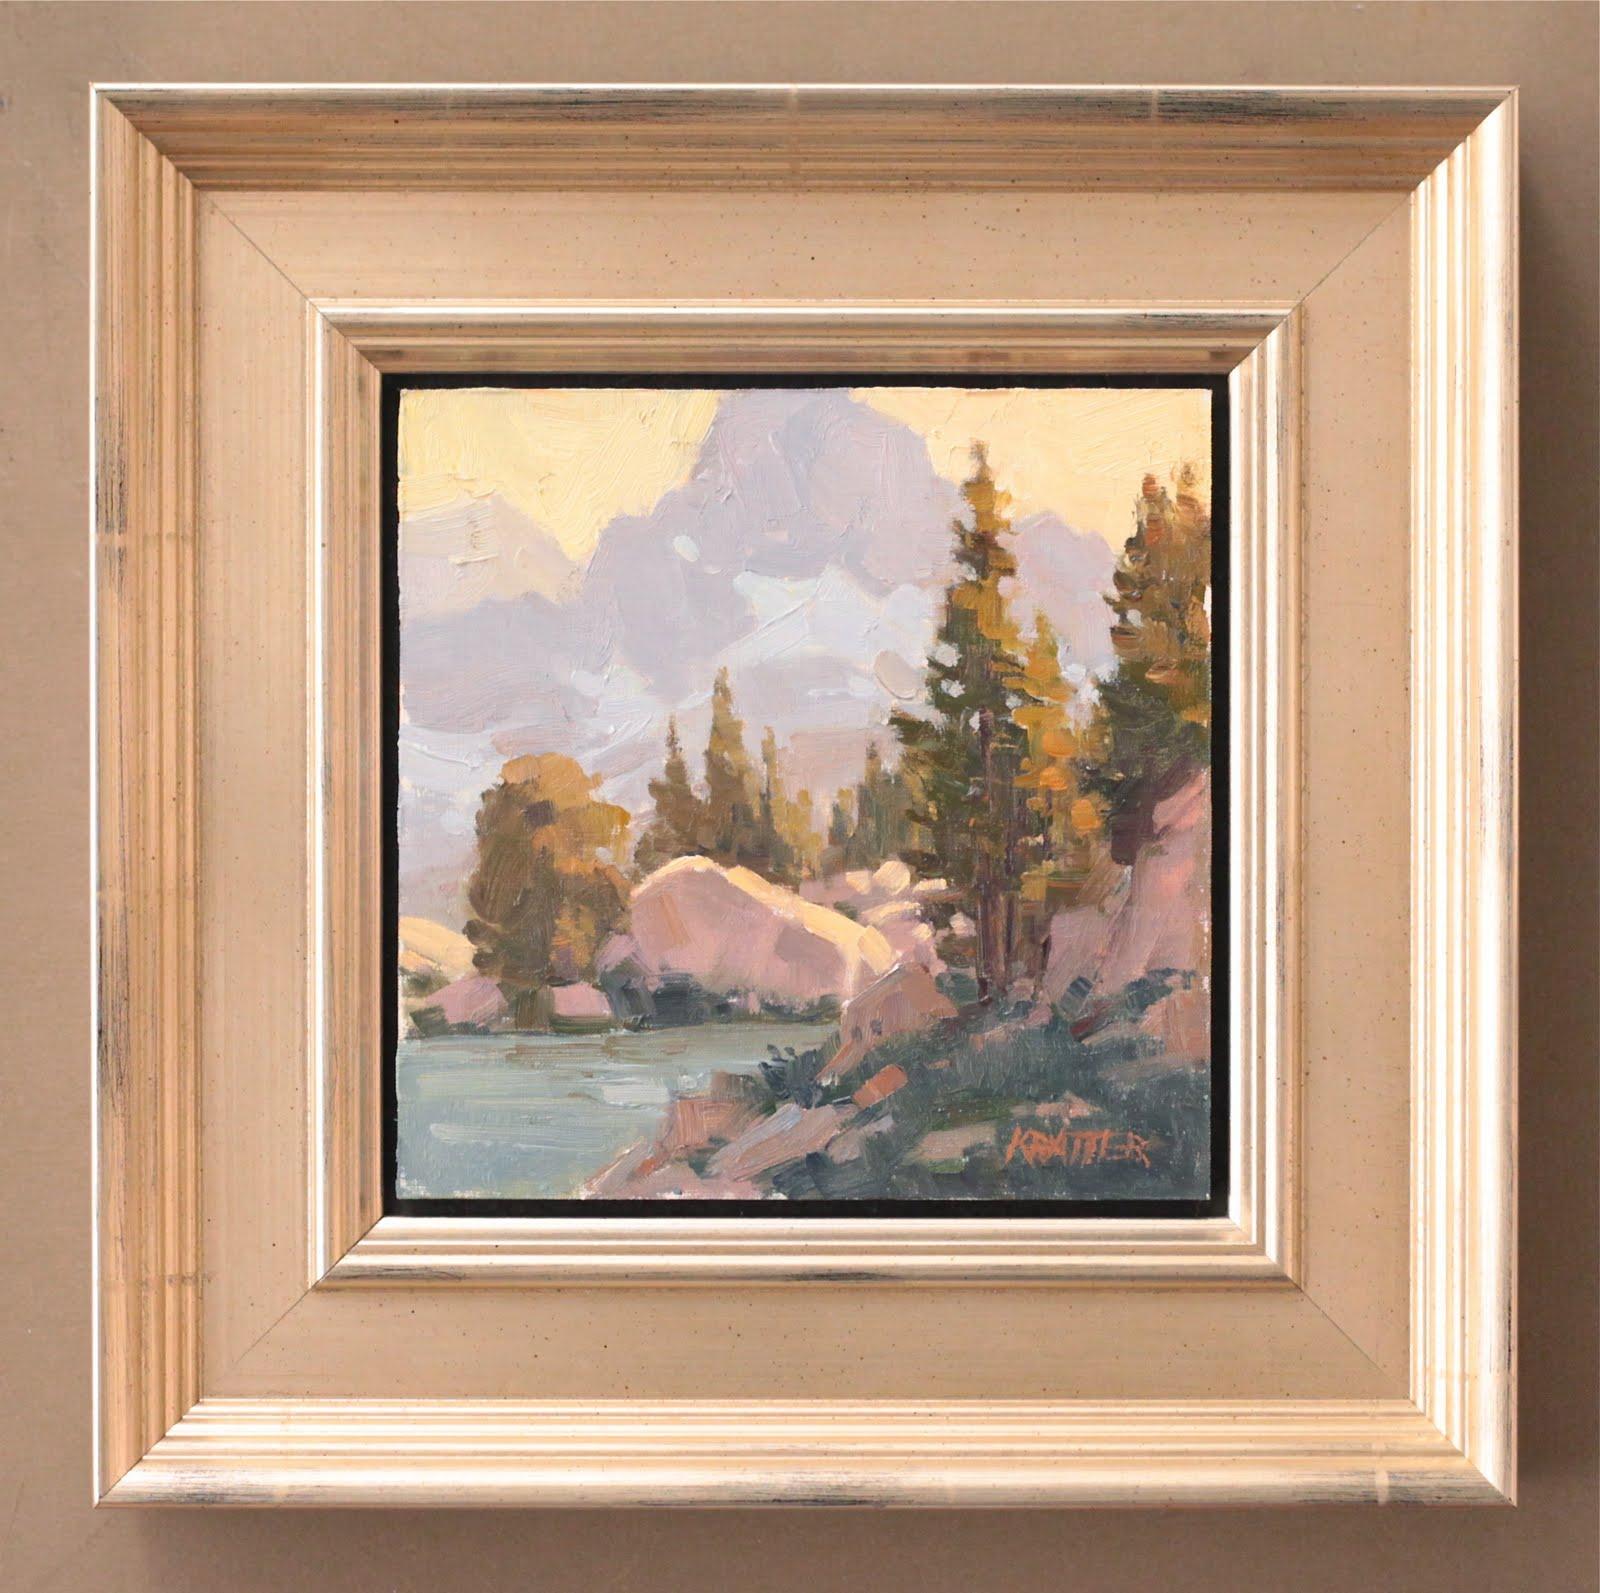 Randy Higbee Gallery: Floater Frames now on kingofframe.com